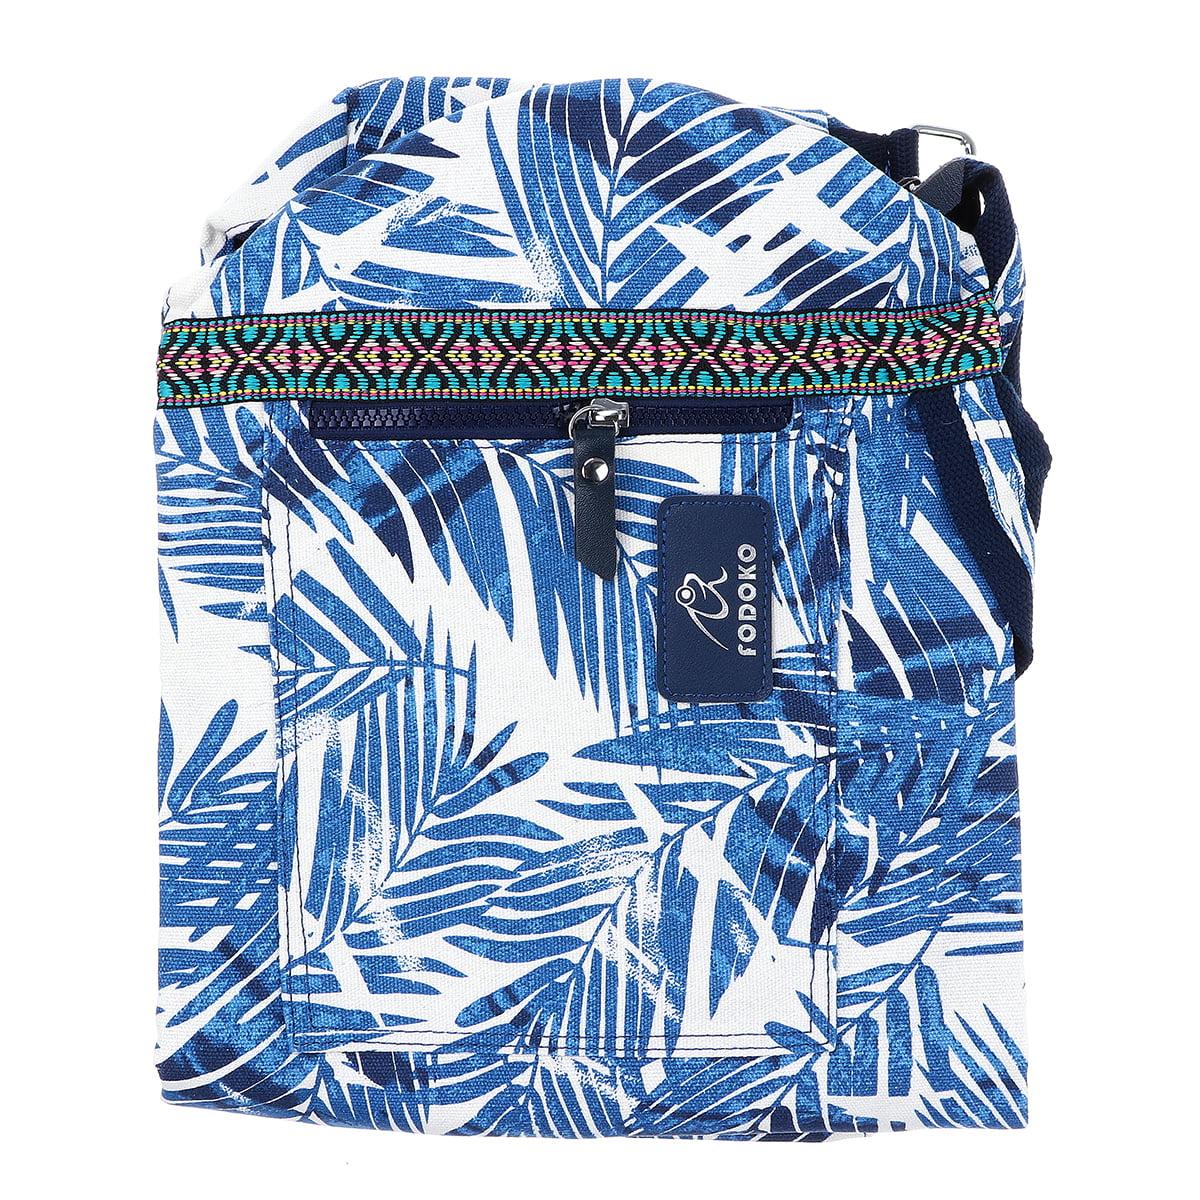 Indian Mandala Handmade Cotton Black Gold Yoga Mat Bag Carry Beach Bags Hippie Mandala Gym Mat Carrier Sports Bags With Shoulder Strap Bags